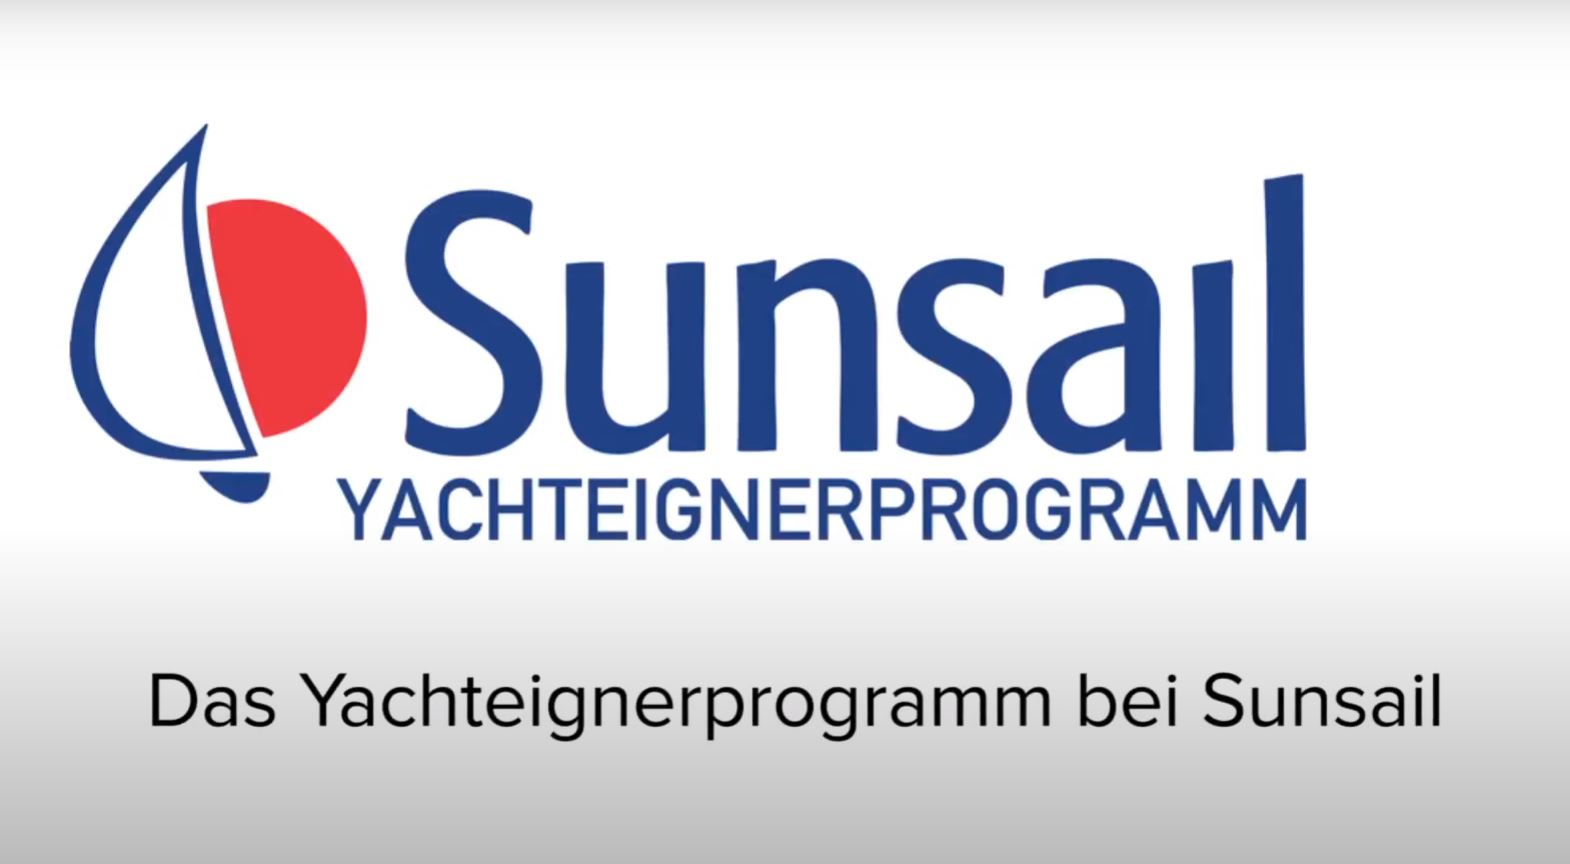 Sunsail Yachteignerprogramm